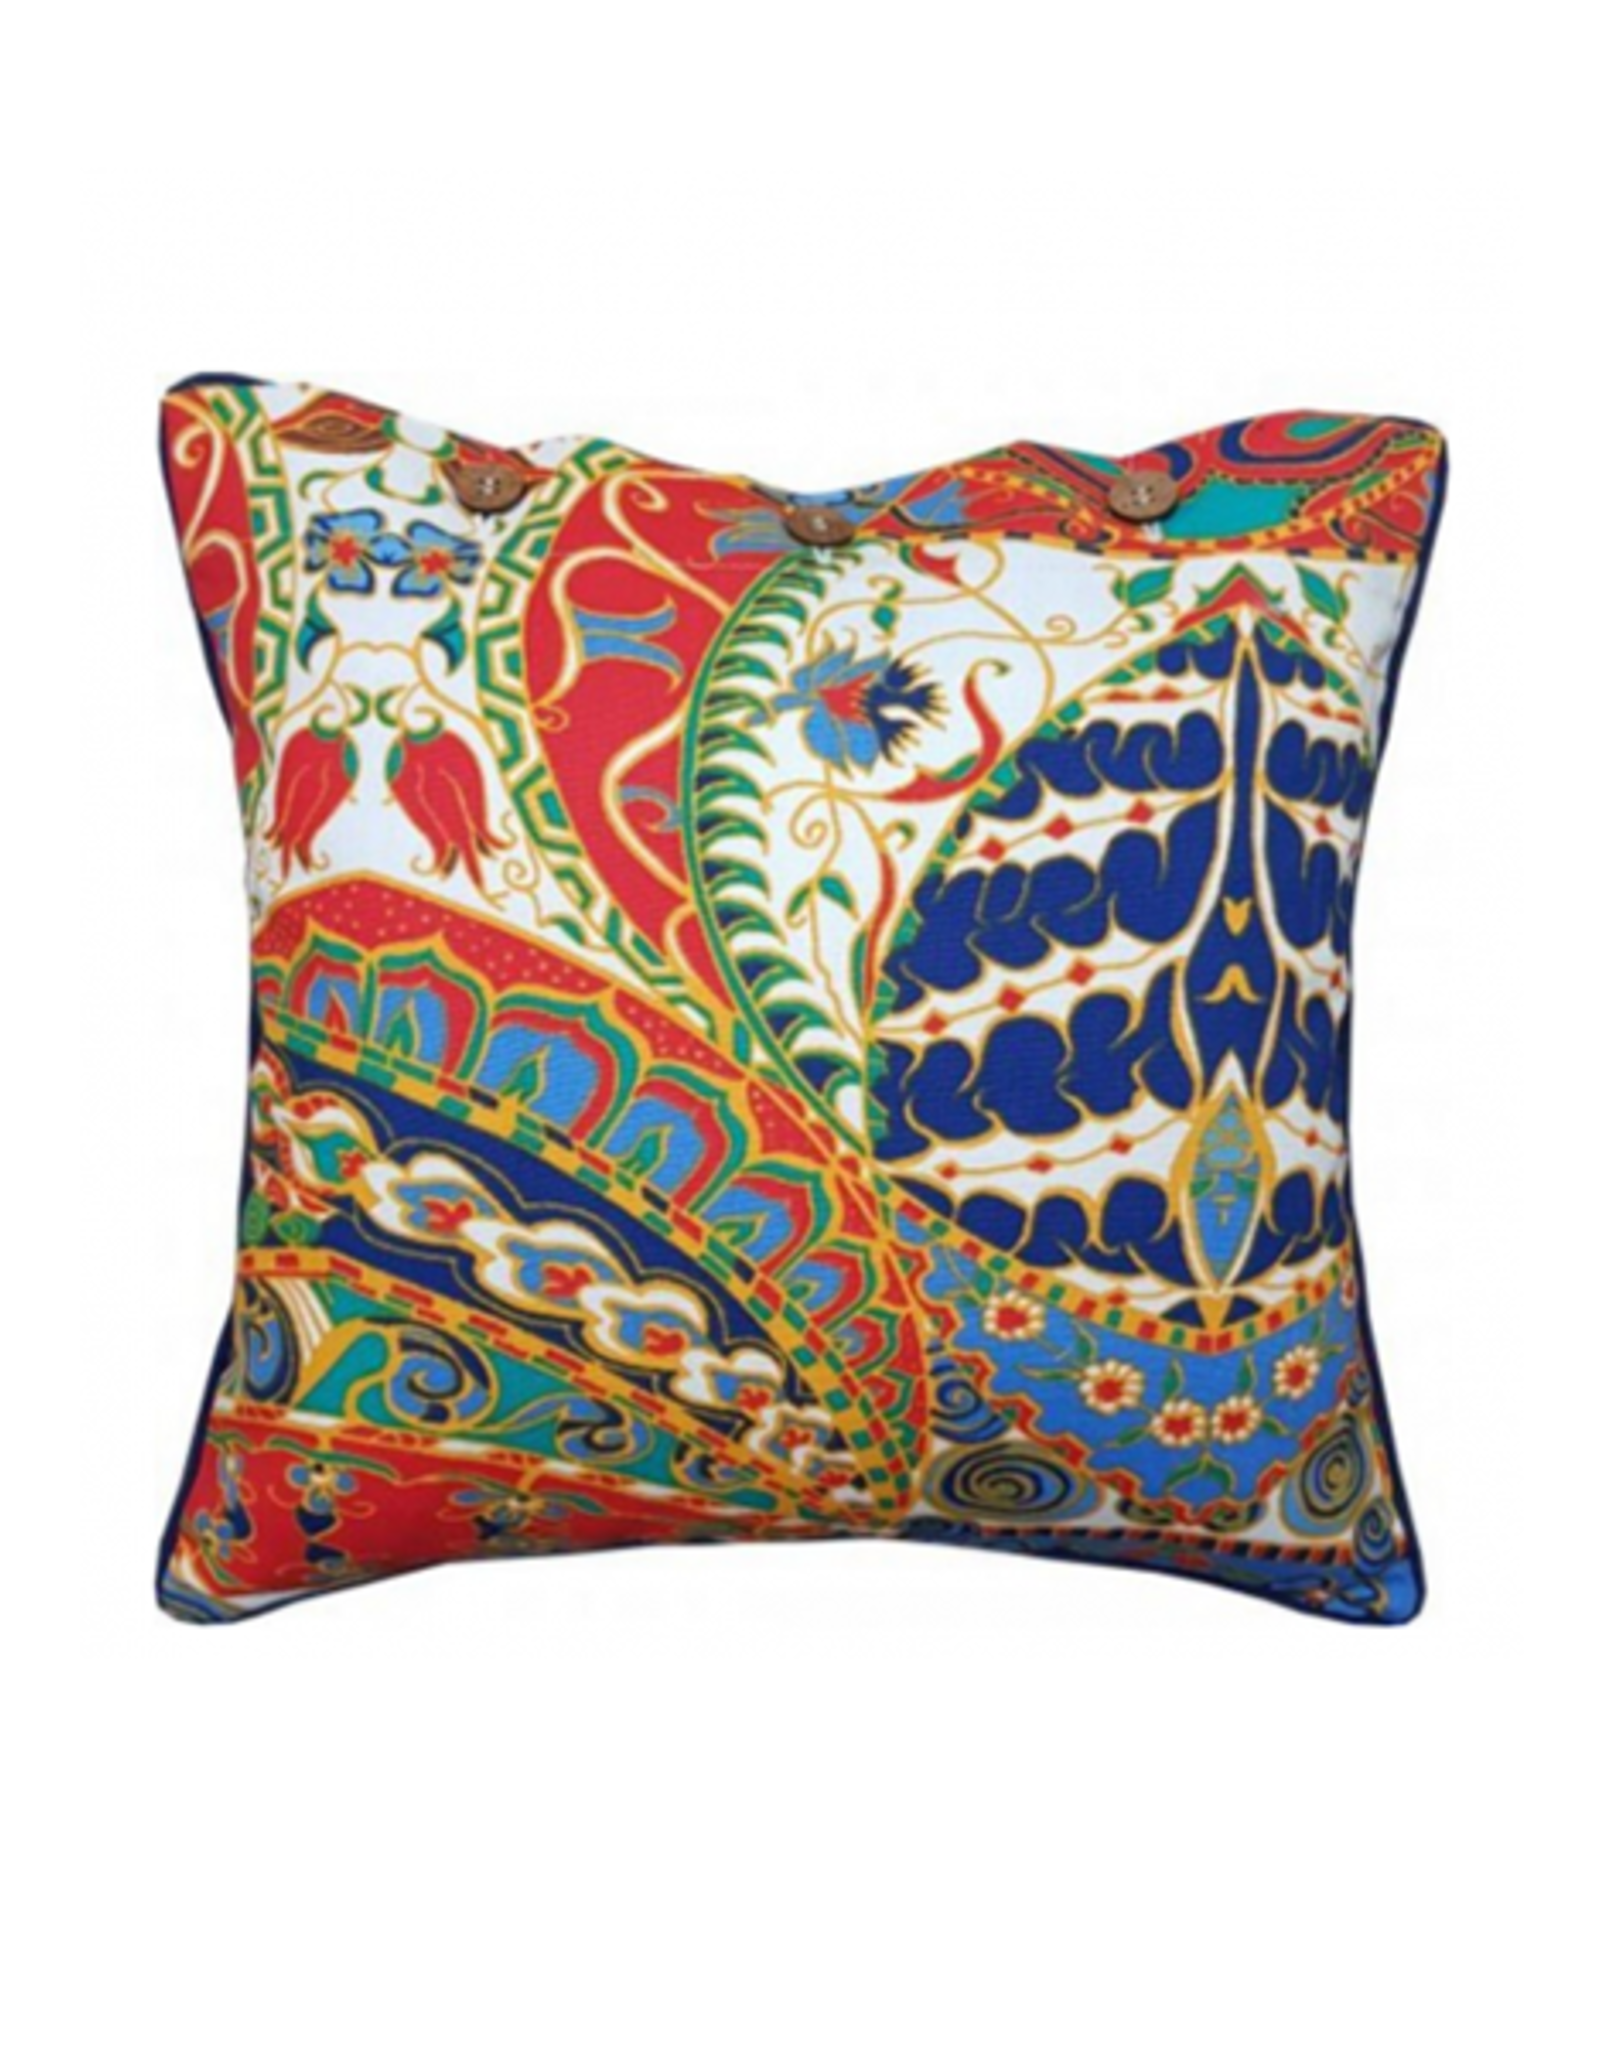 Craft Studio Ankara Cushion Cover 40x40cm